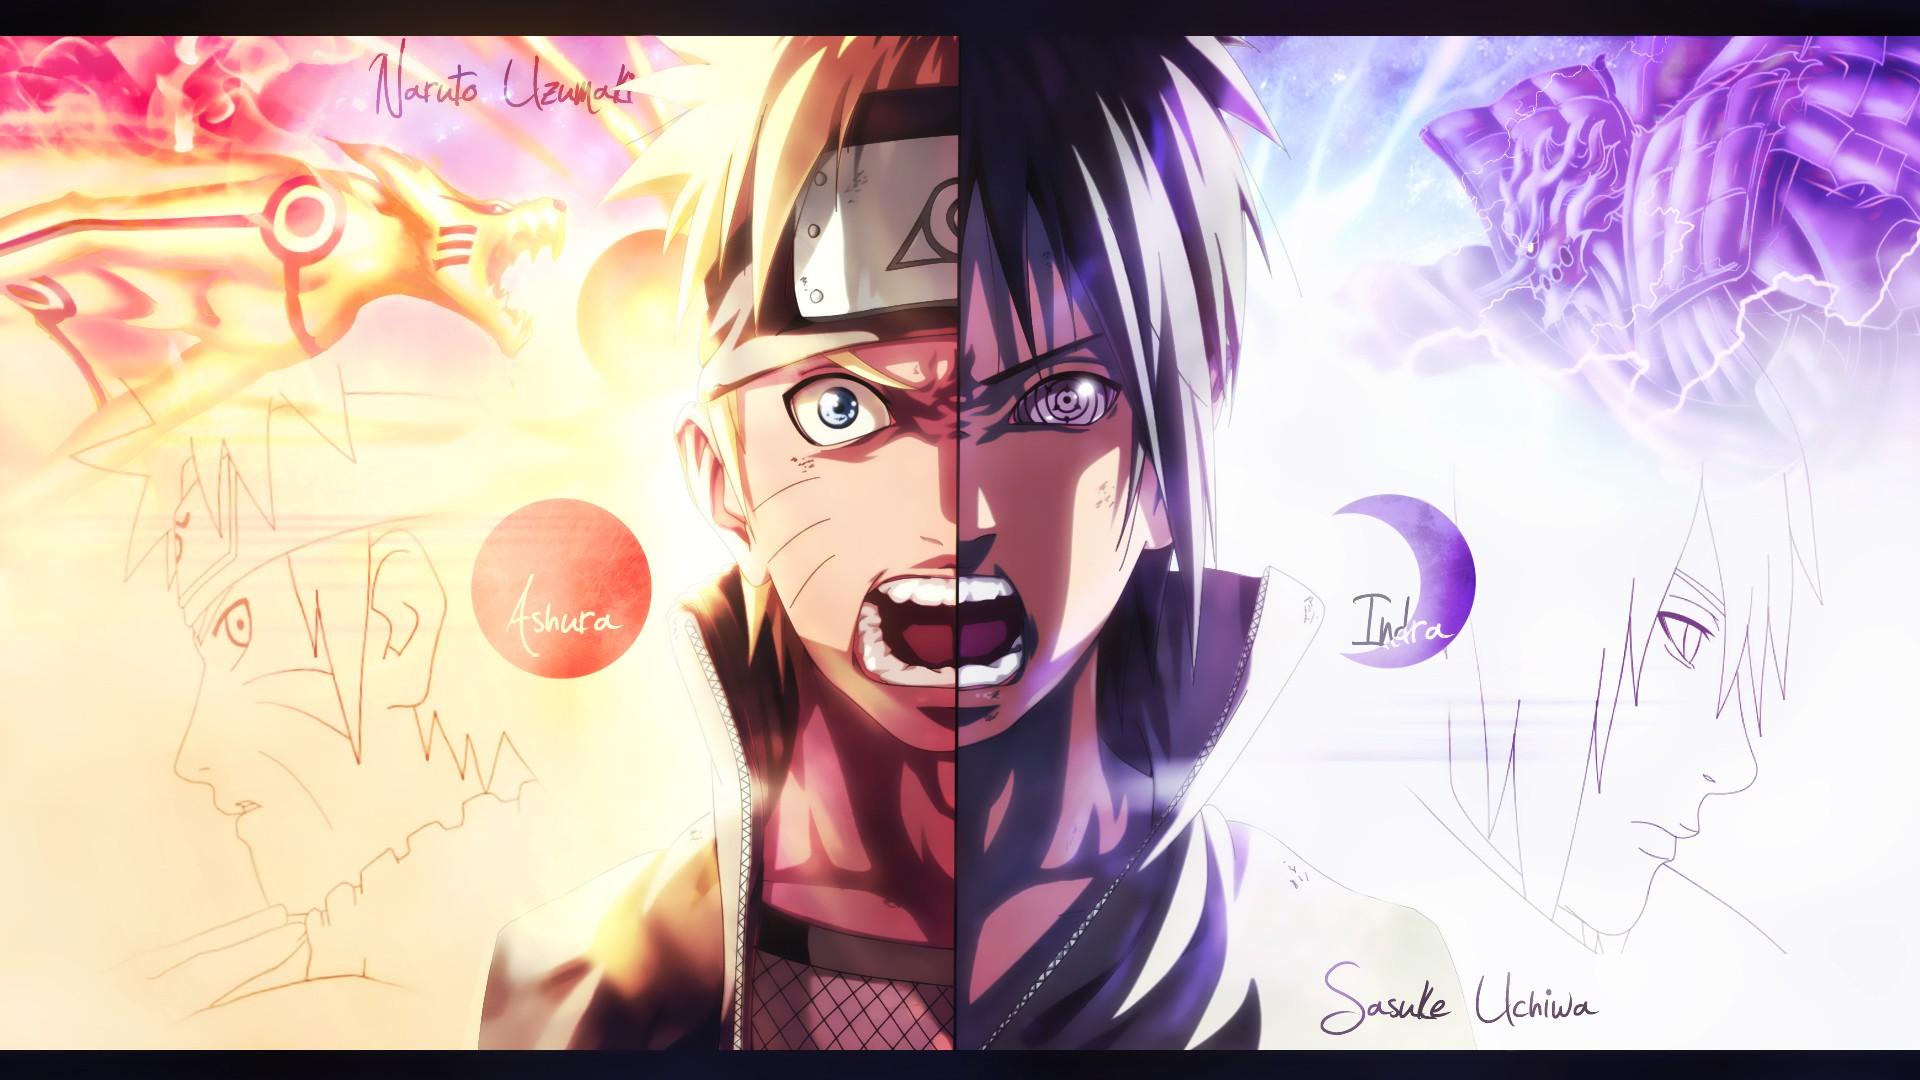 illustration anime cartoon Naruto Shippuuden Uzumaki Naruto Uchiha Sasuke screaming splitting Kurama Susanoo character Rinnegan screenshot mangaka 201653